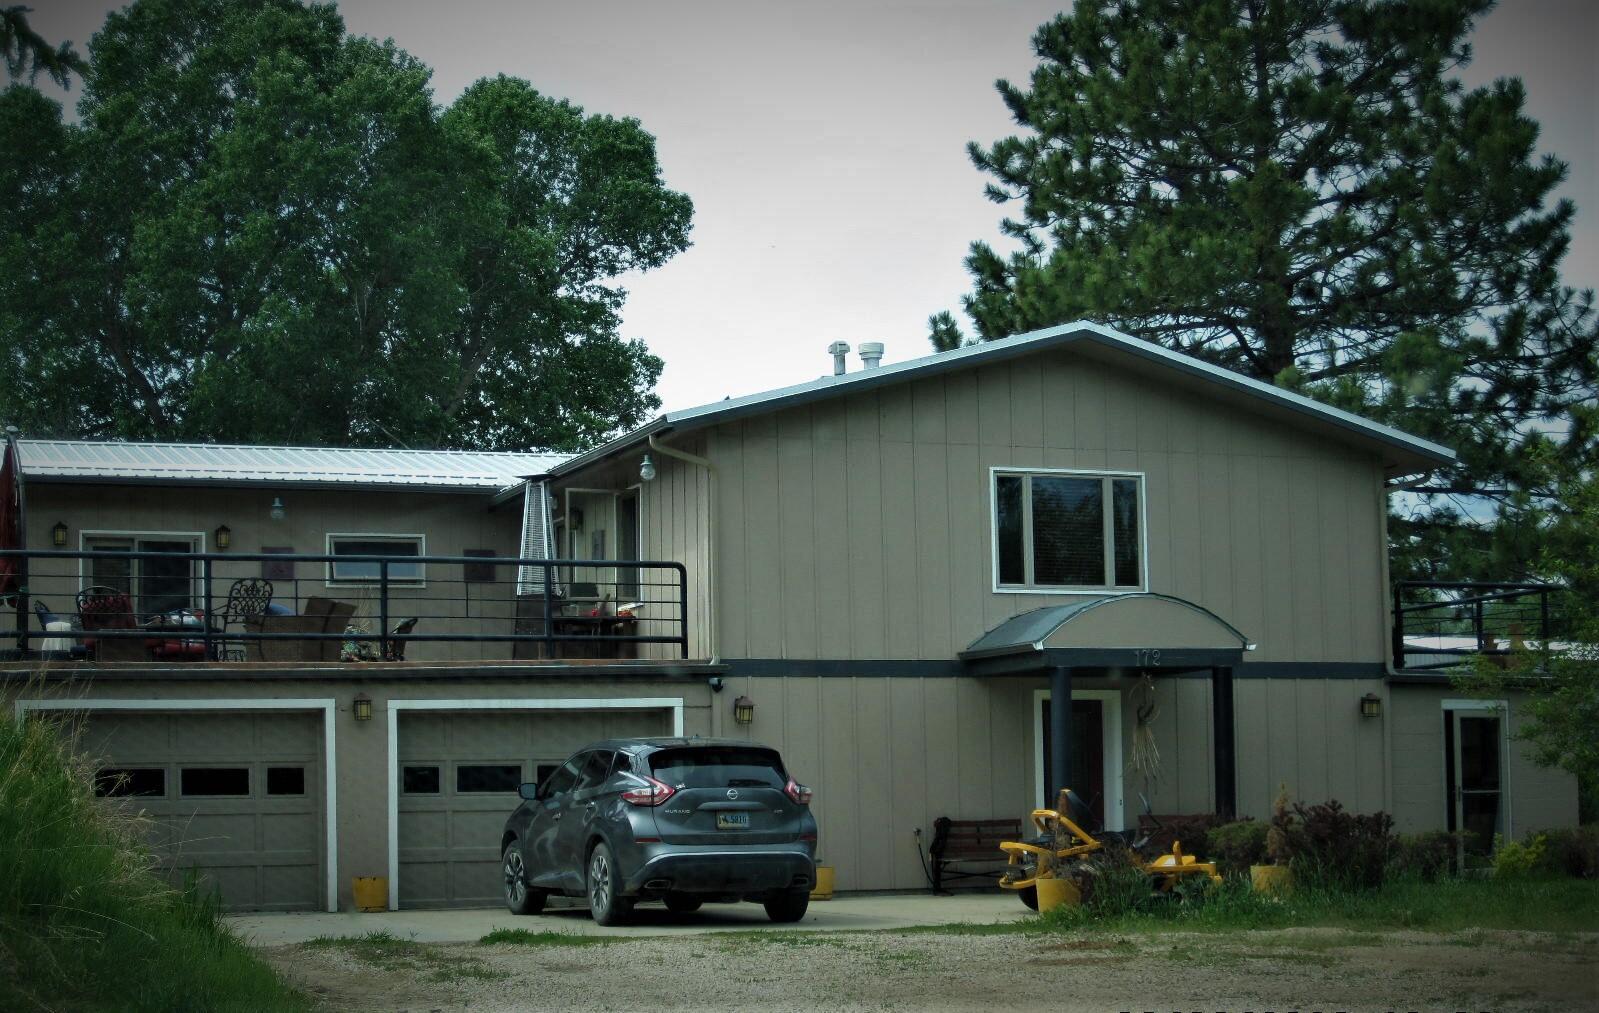 172 Upper Clear Creek Road, Buffalo, Wyoming 82834, 4 Bedrooms Bedrooms, ,3 BathroomsBathrooms,Residential,For Sale,Upper Clear Creek,21-1109